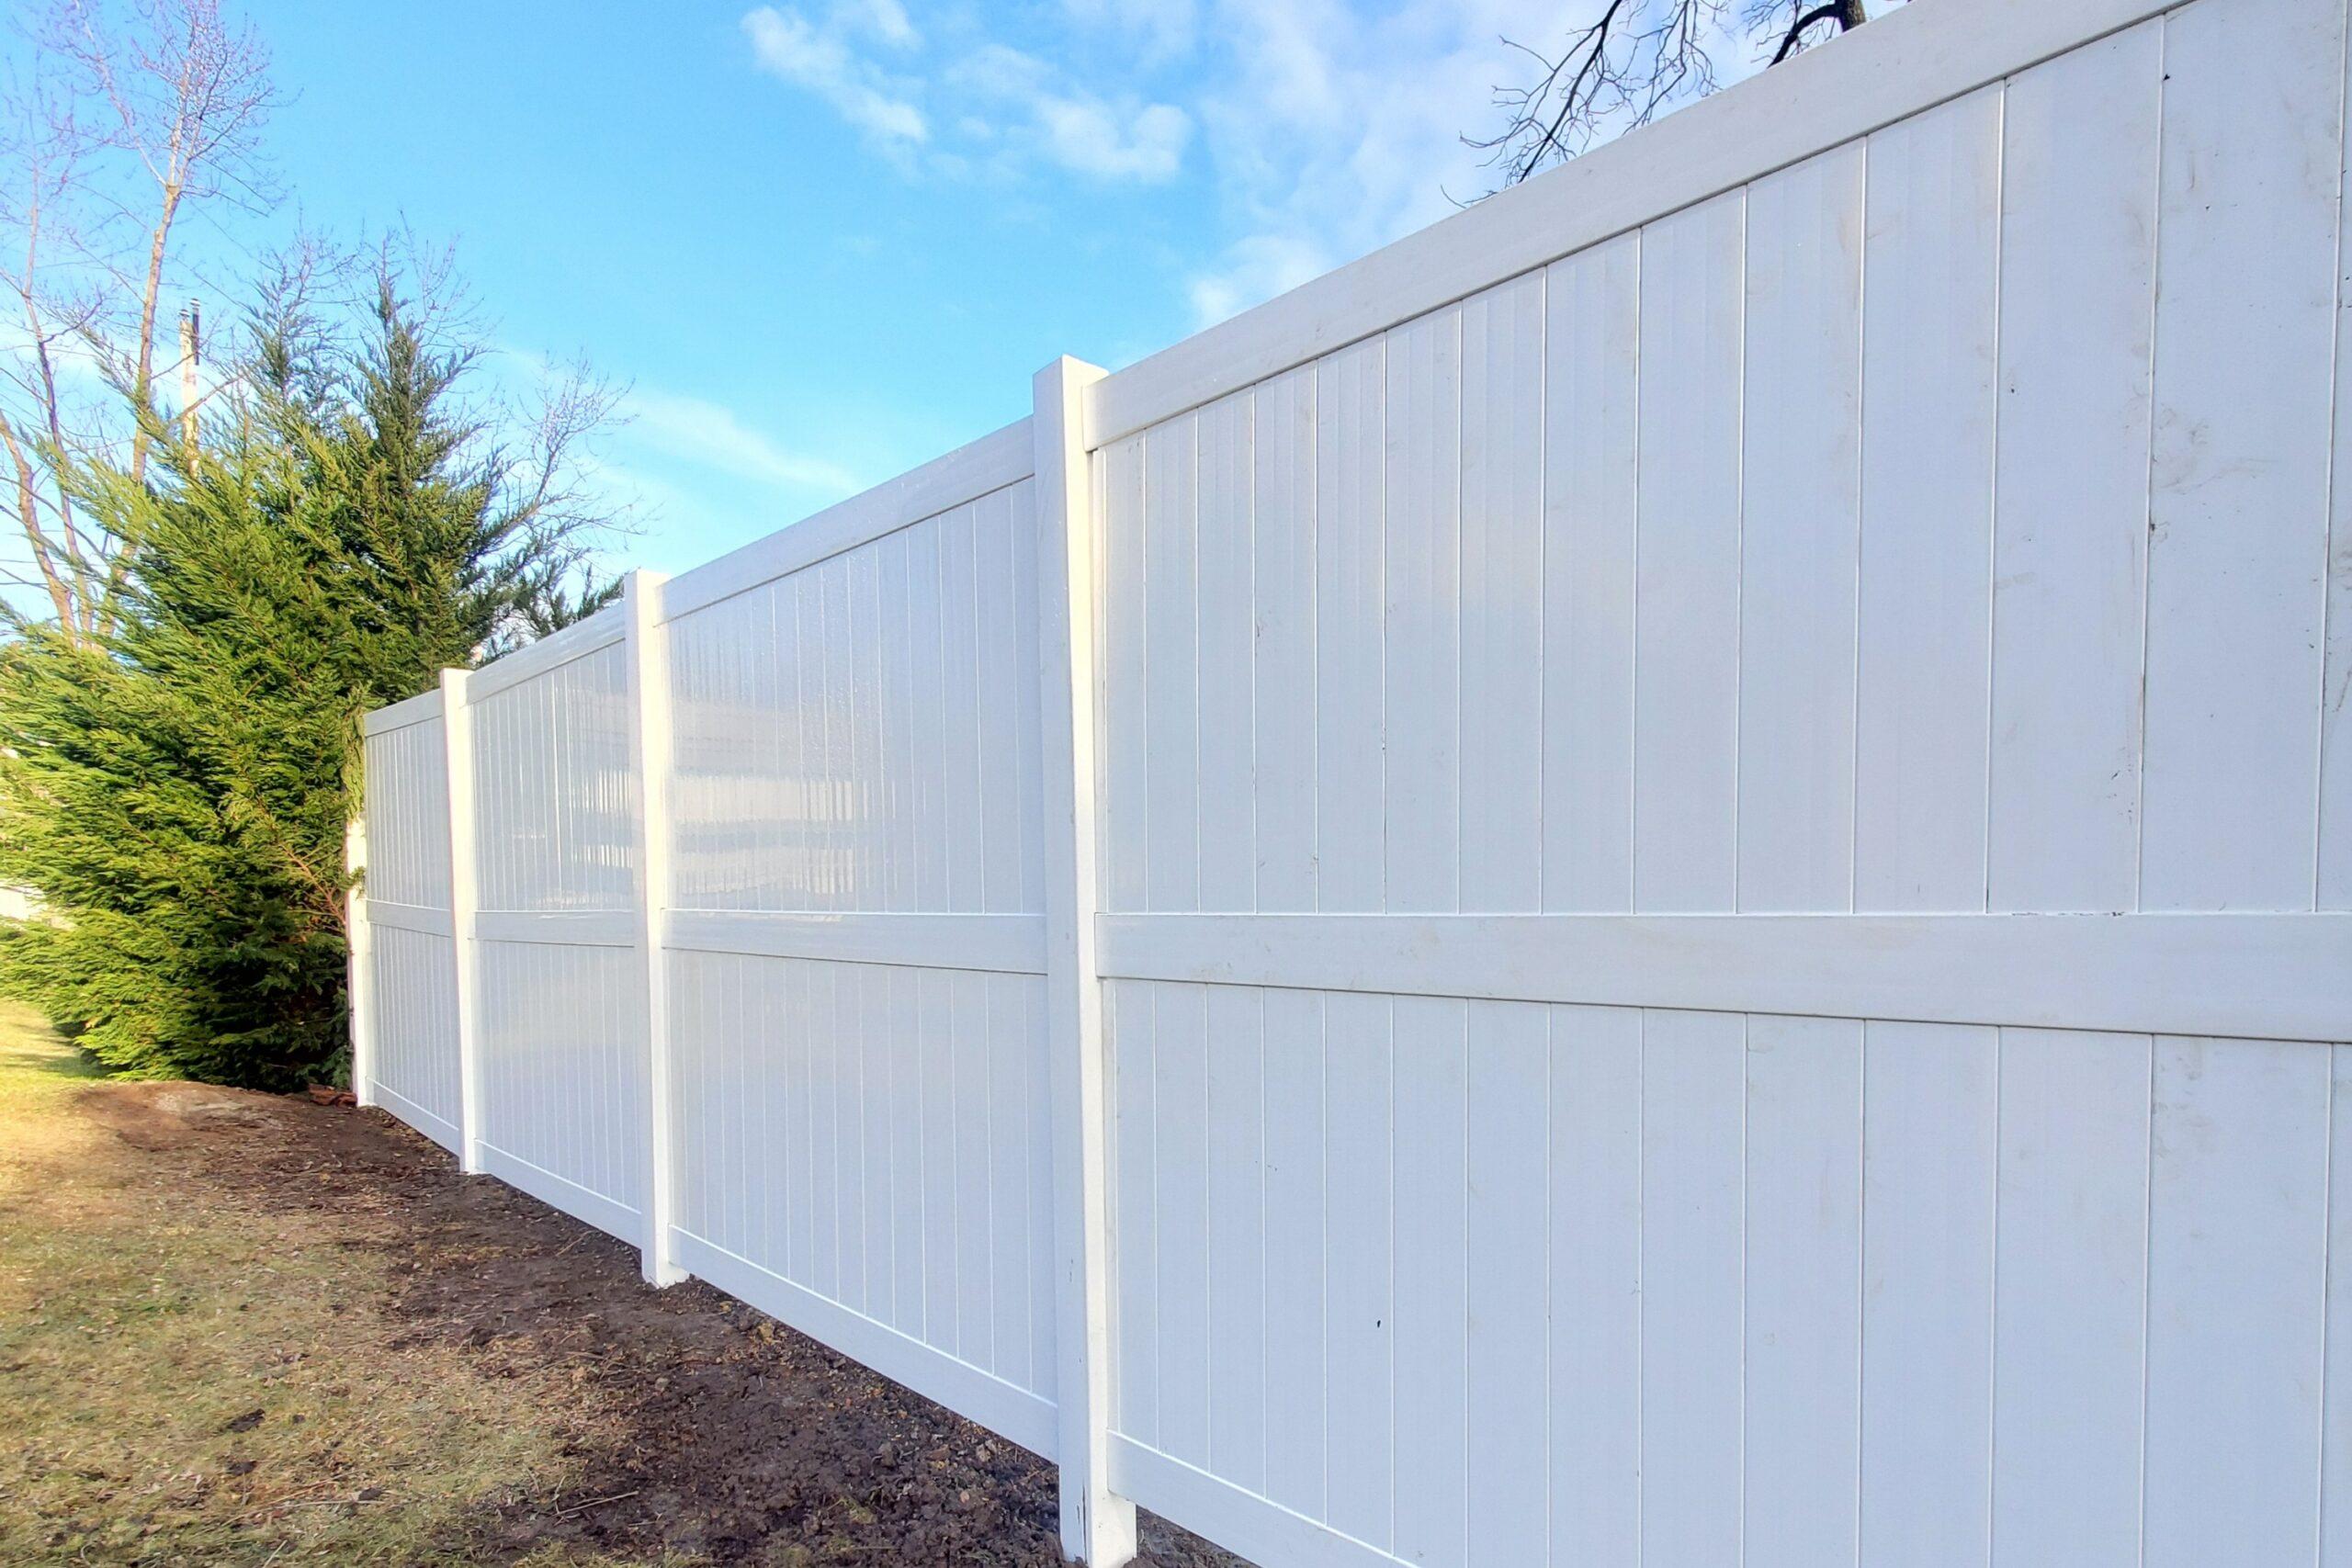 Fence Company - Hanover, PA - Hanover, PA Fence Contractors - DREAMscape's